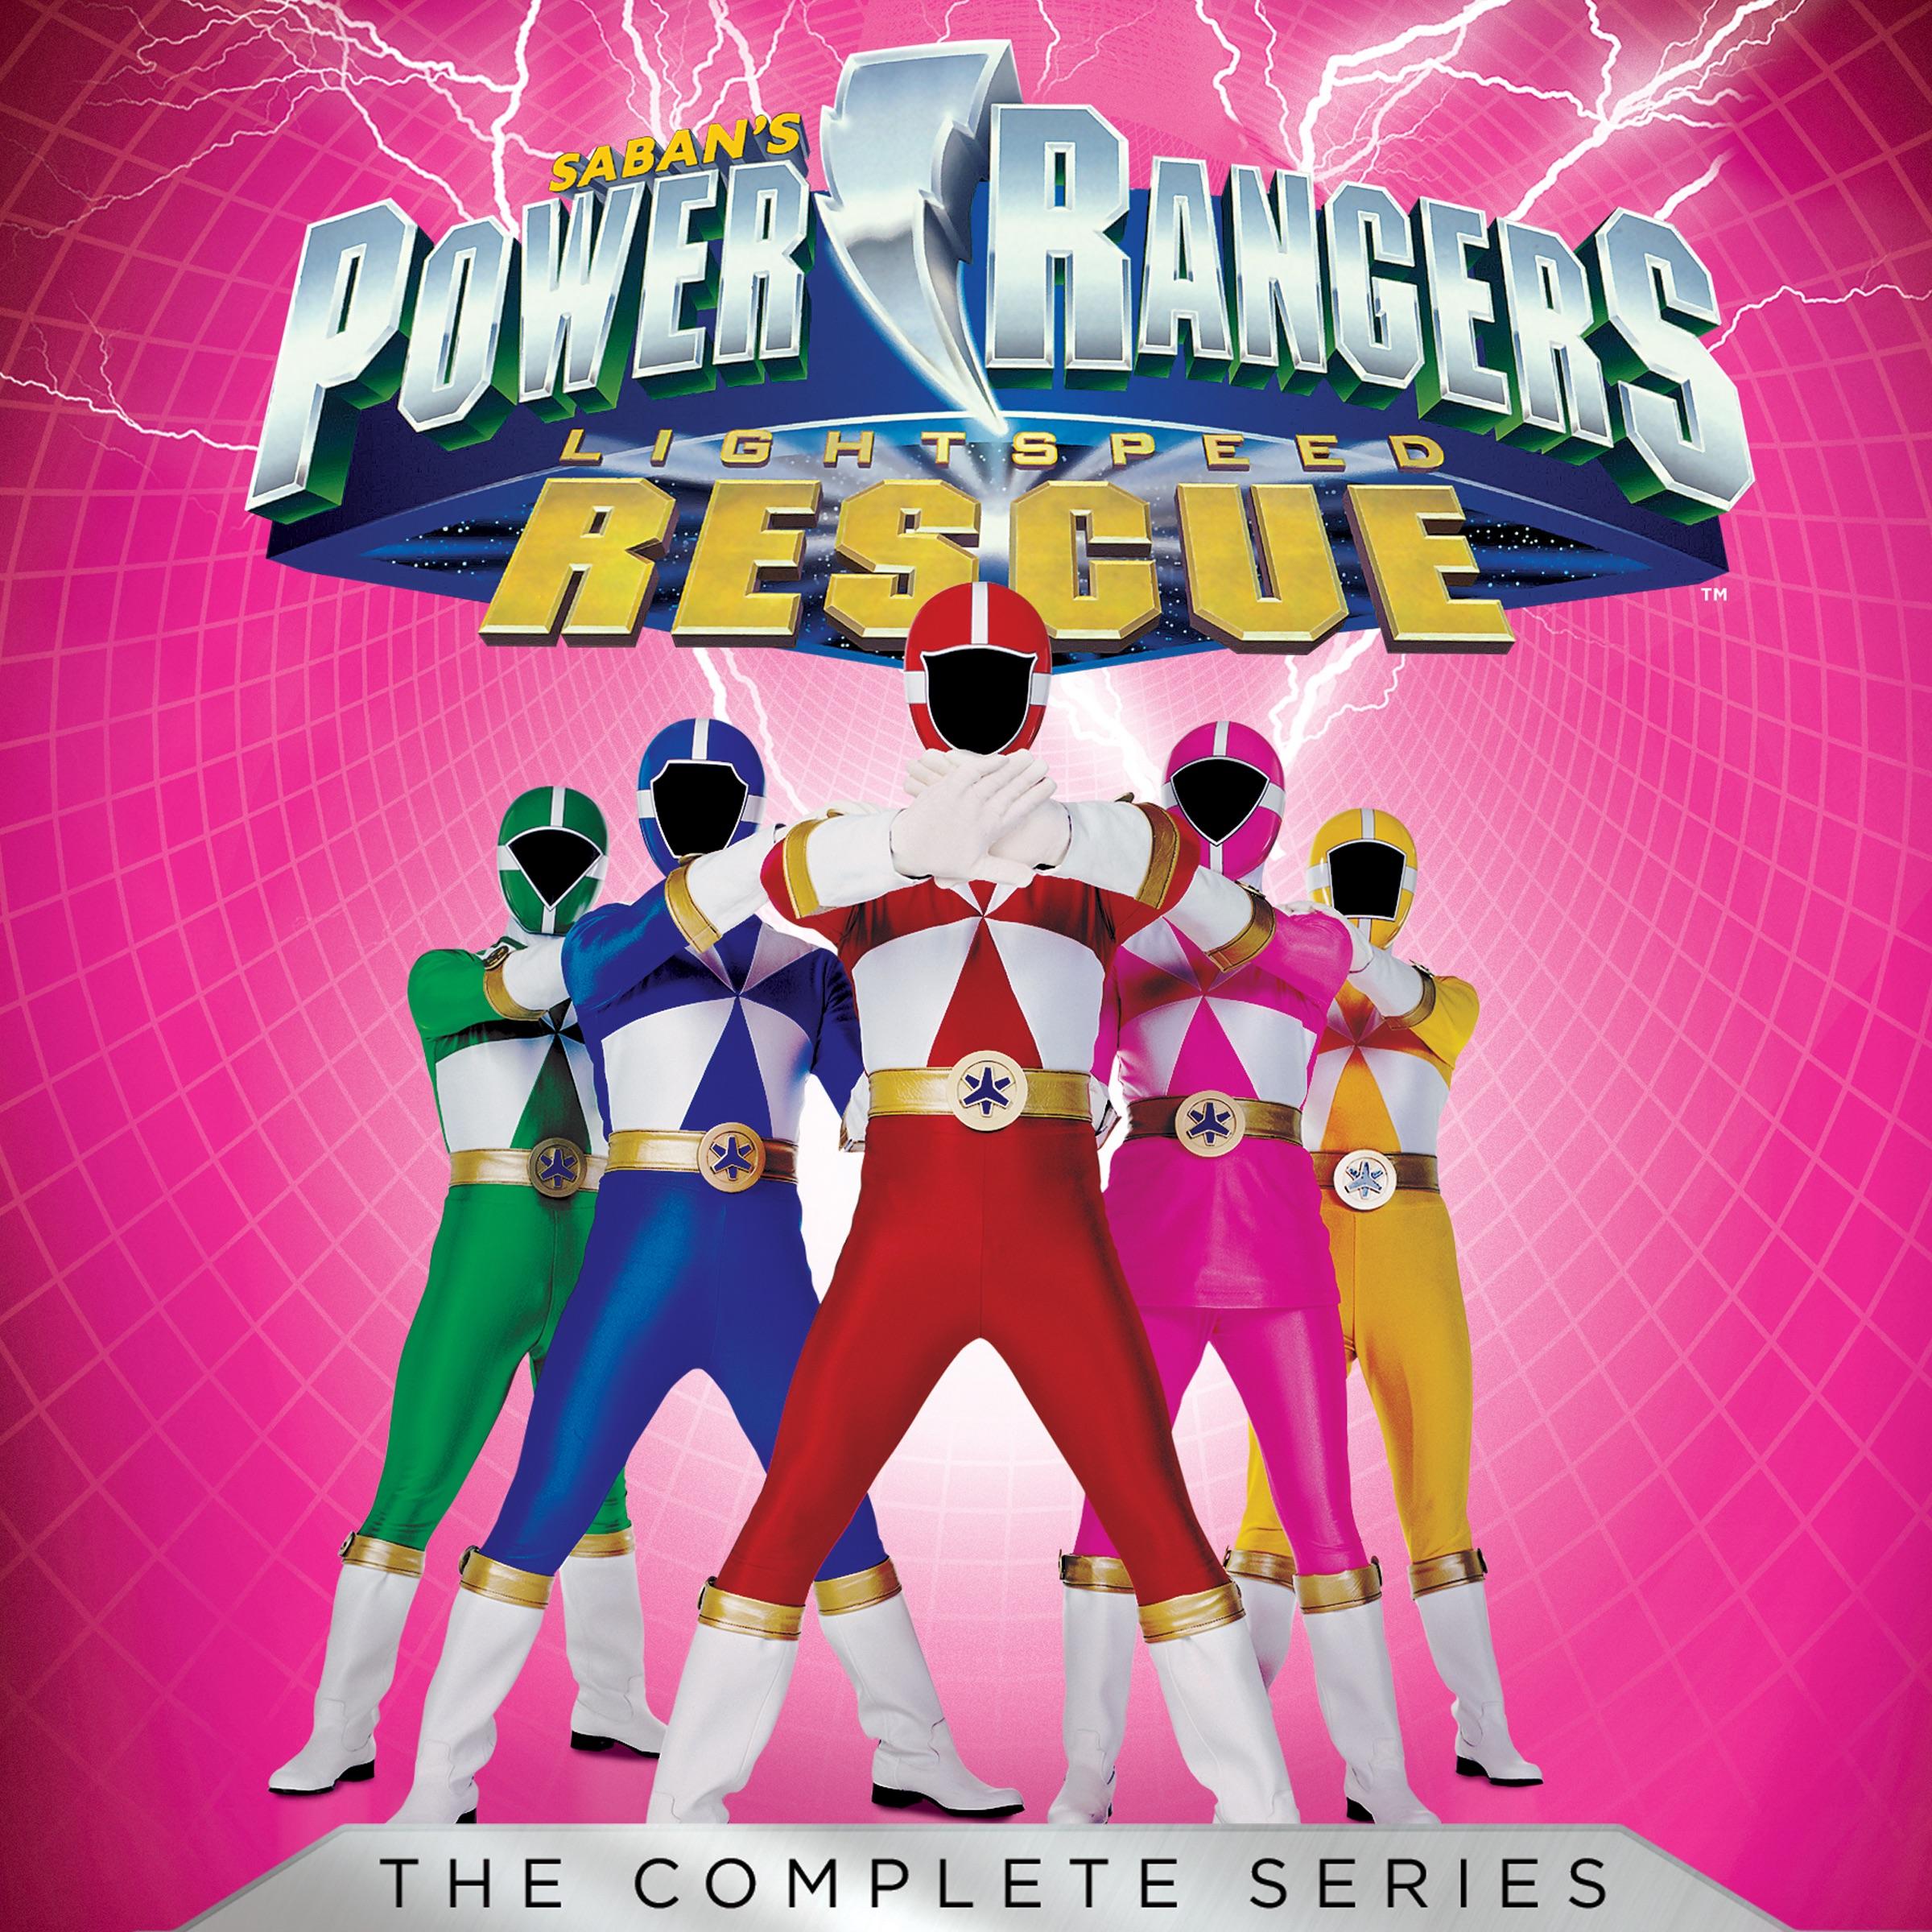 Power Rangers: Lightspeed Rescue on iTunes